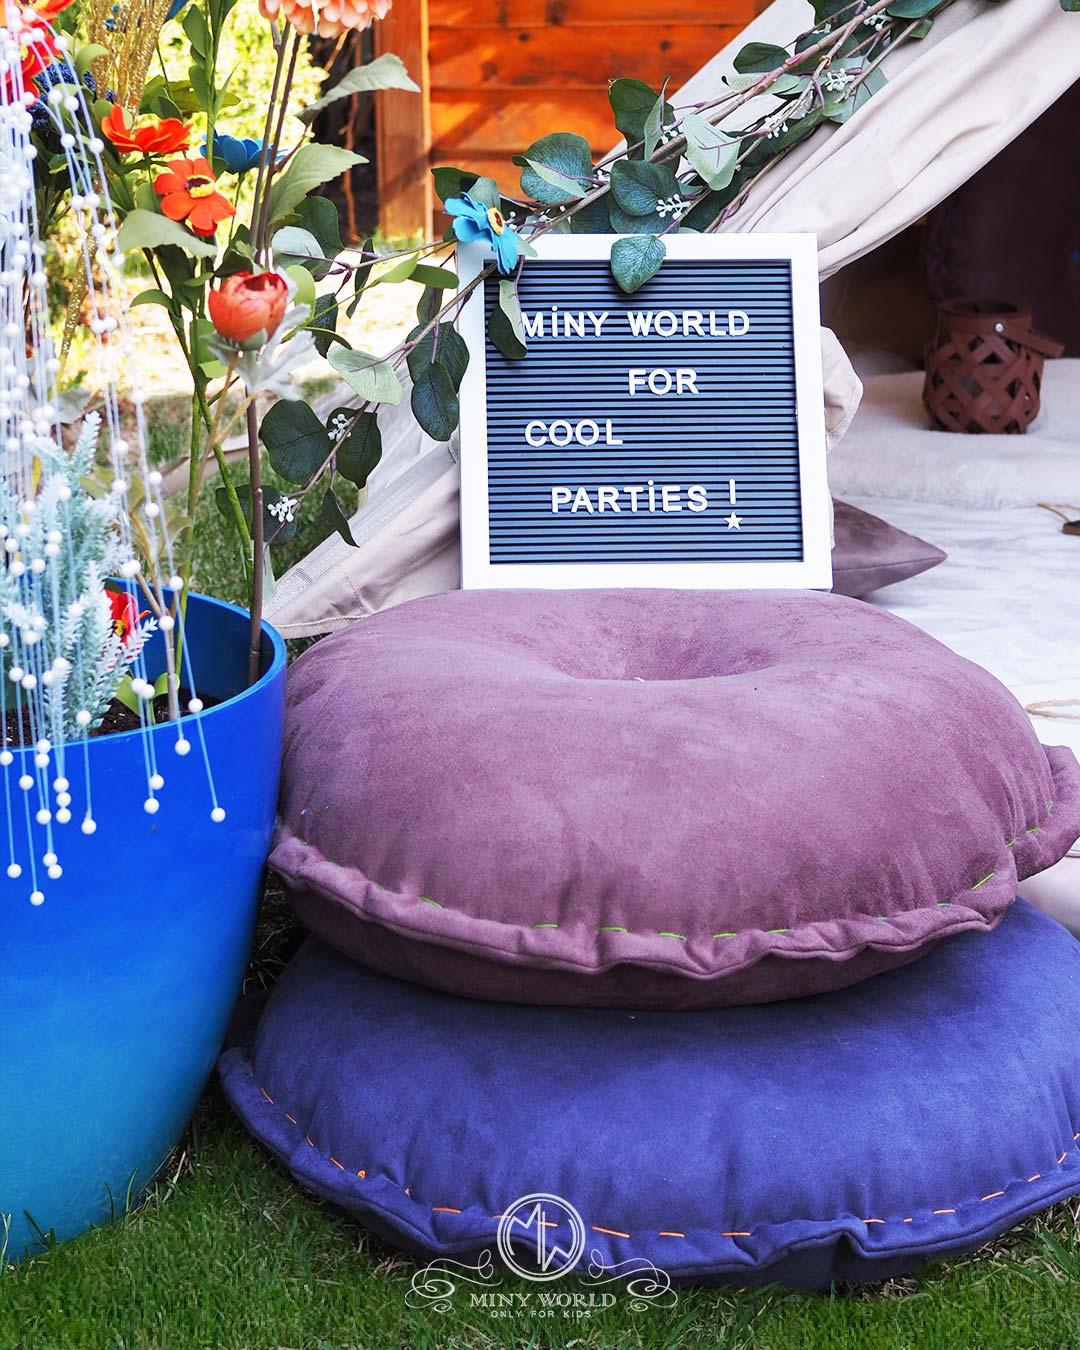 Bel-tent-party-miny-world-family-78